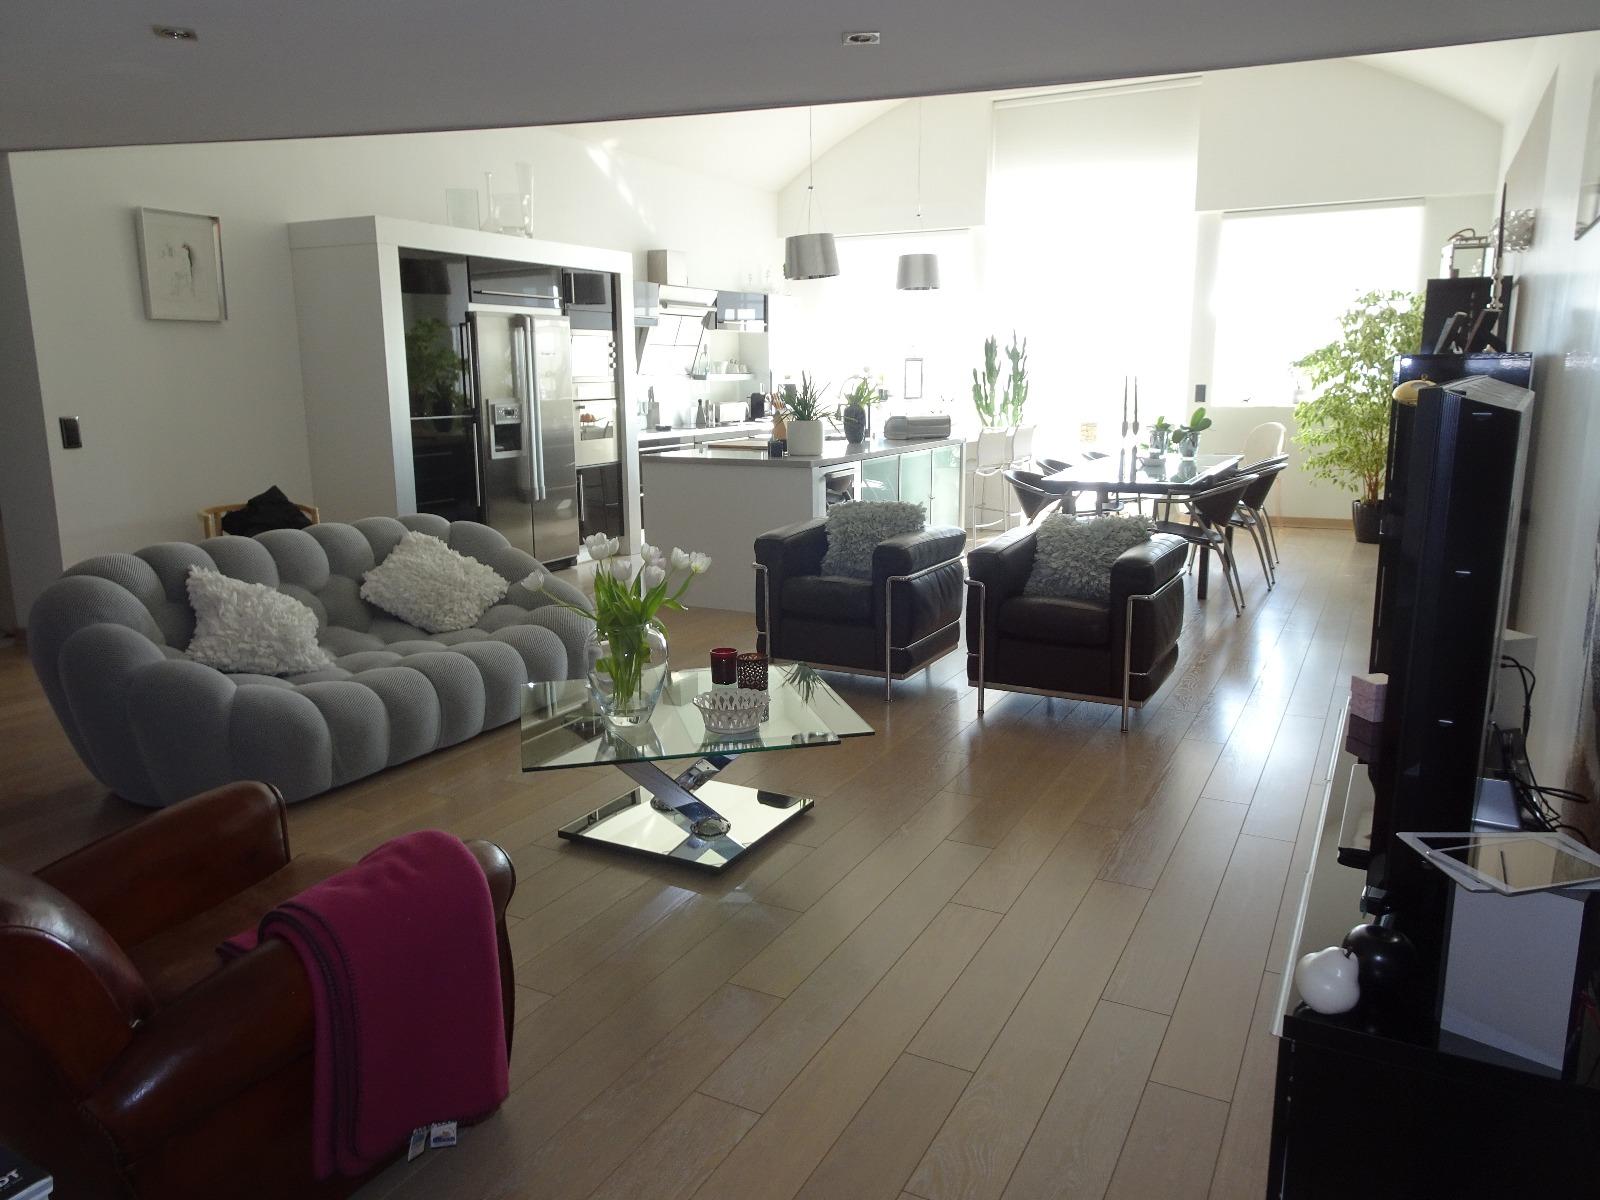 Achat sedan appartement loft vendre turenne immo for Achat appartement loft